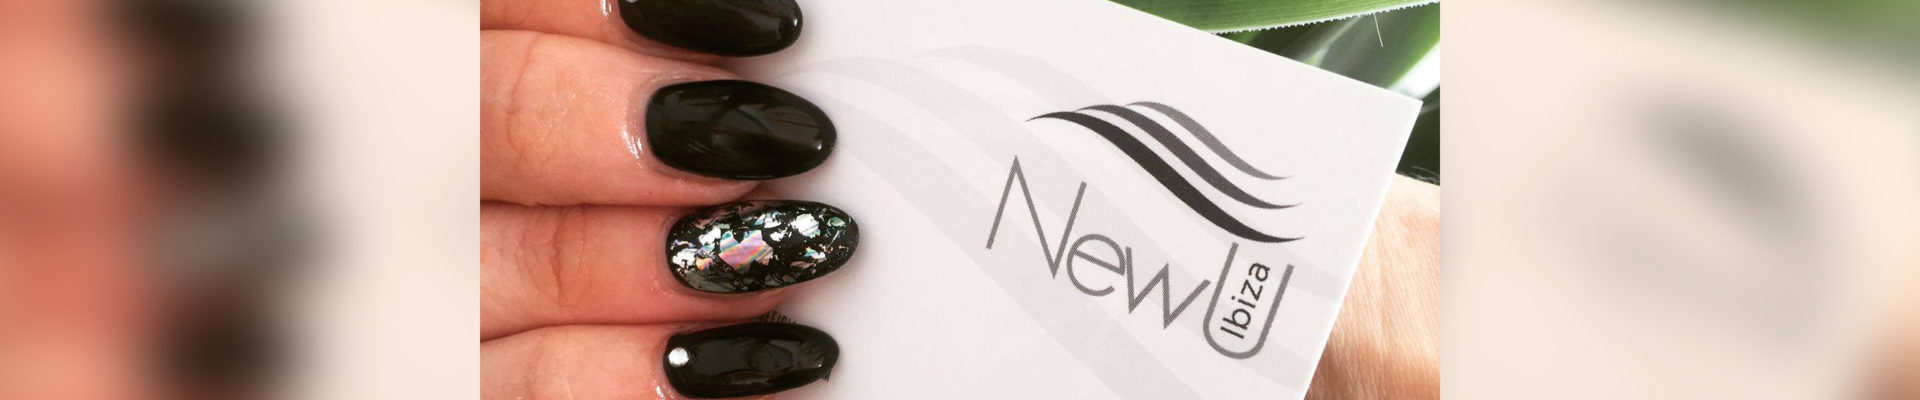 New U Salon Ibiza – Hair & Beauty Specialists